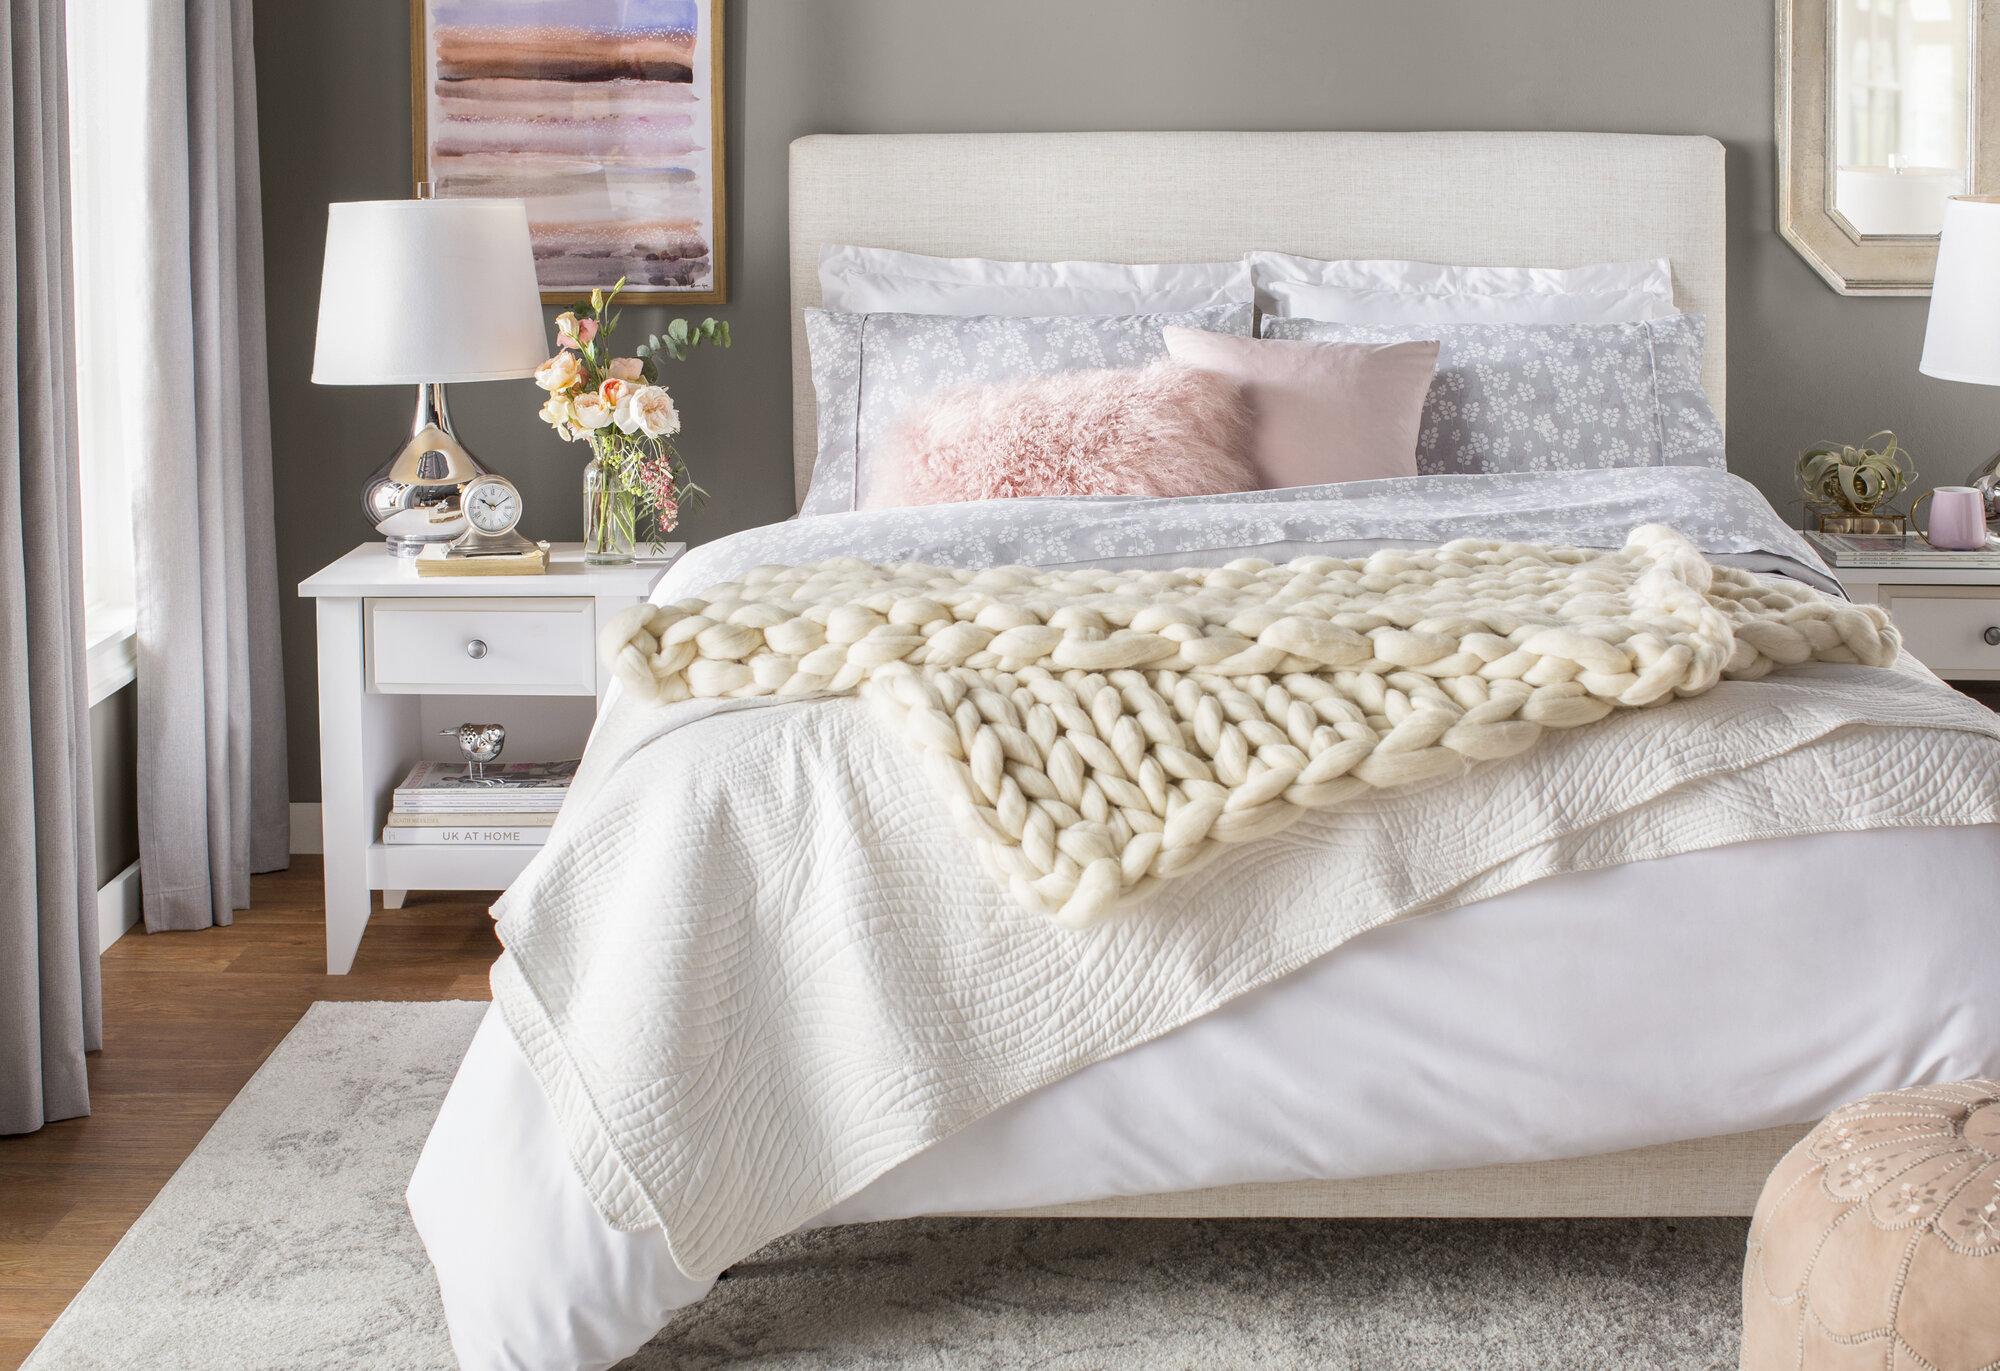 Skyline Furniture Upholstered Panel Bed Size Full Color Talc